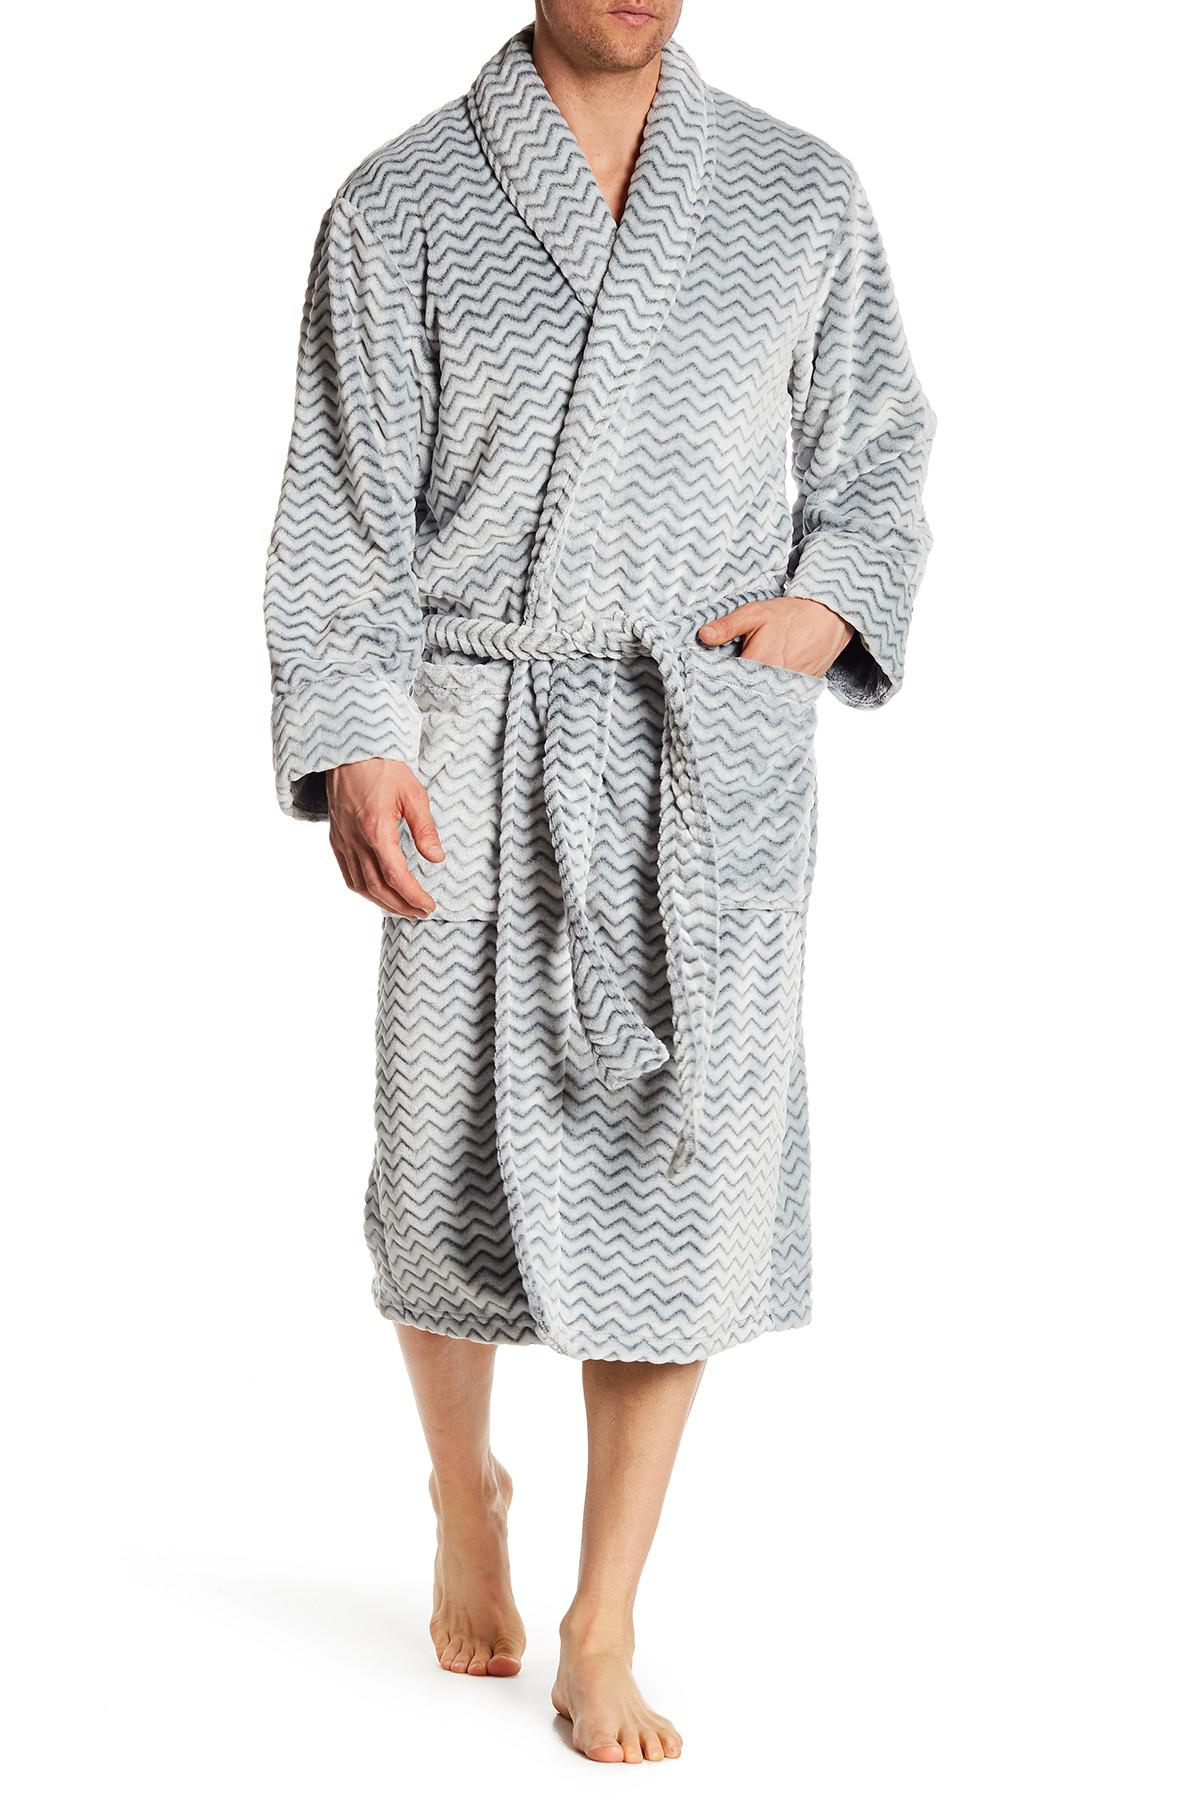 Lyst - Daniel Buchler Herringbone Plush Robe in Black for Men 2db8c643a